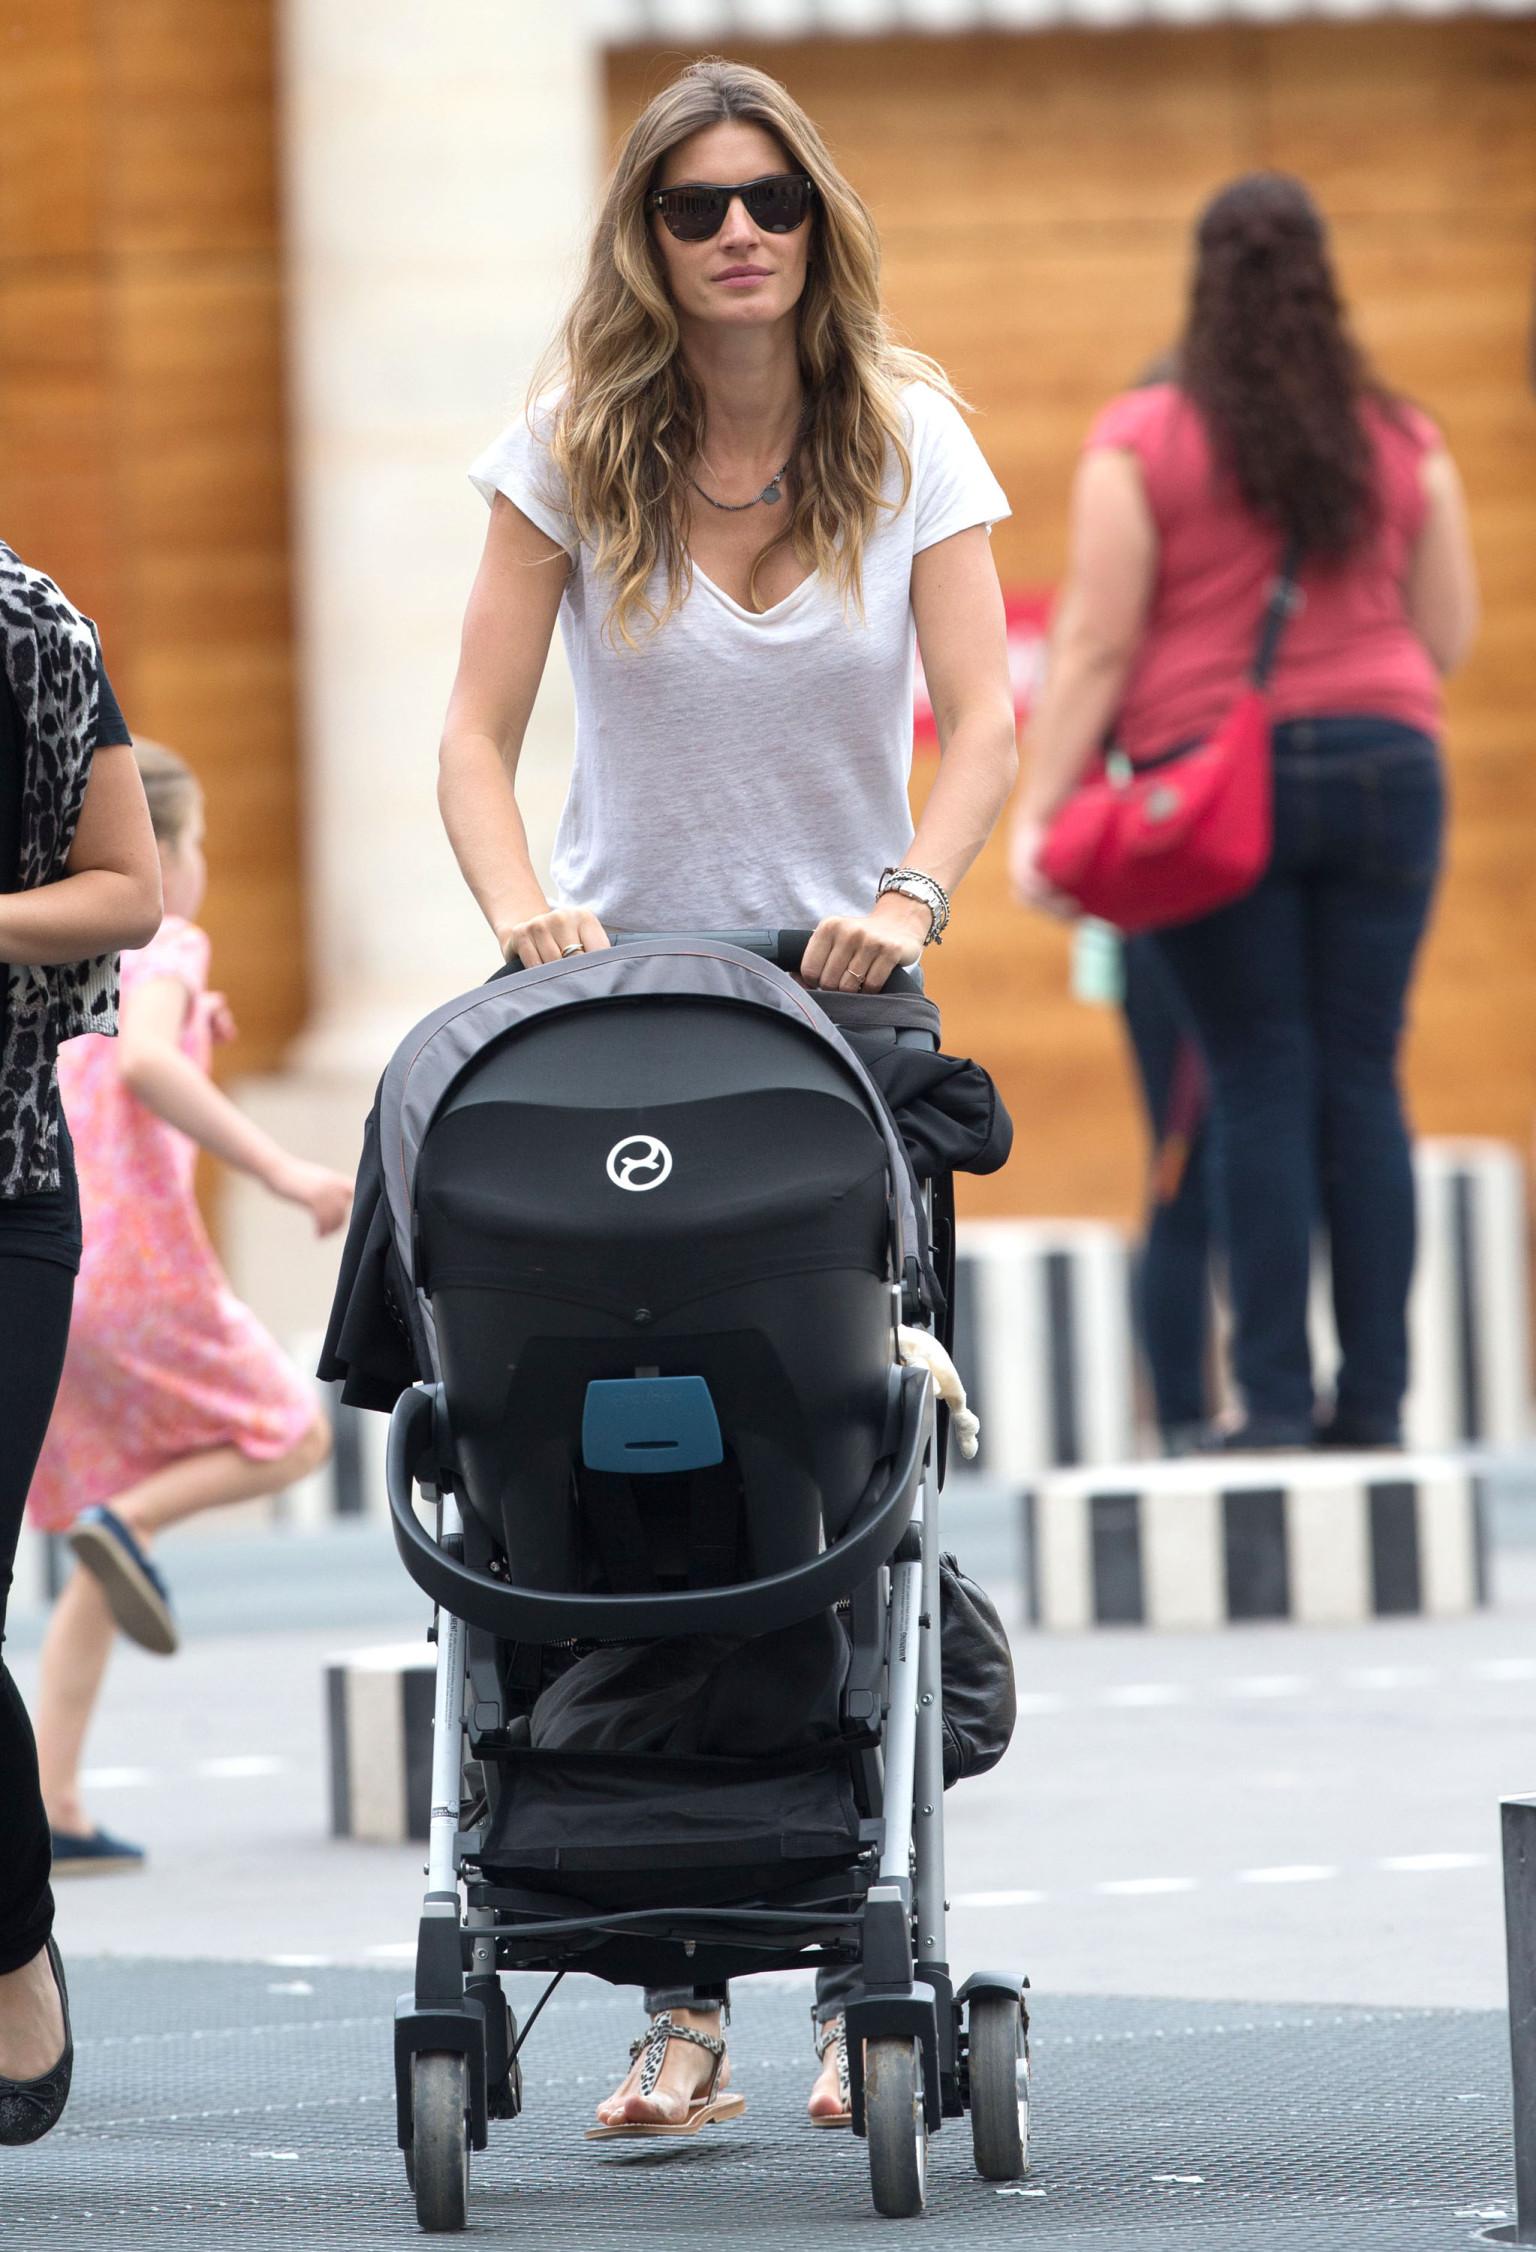 Gisele Bundchen, Daughter Vivian Go Sightseeing In Paris ... Gisele Bundchen Facebook